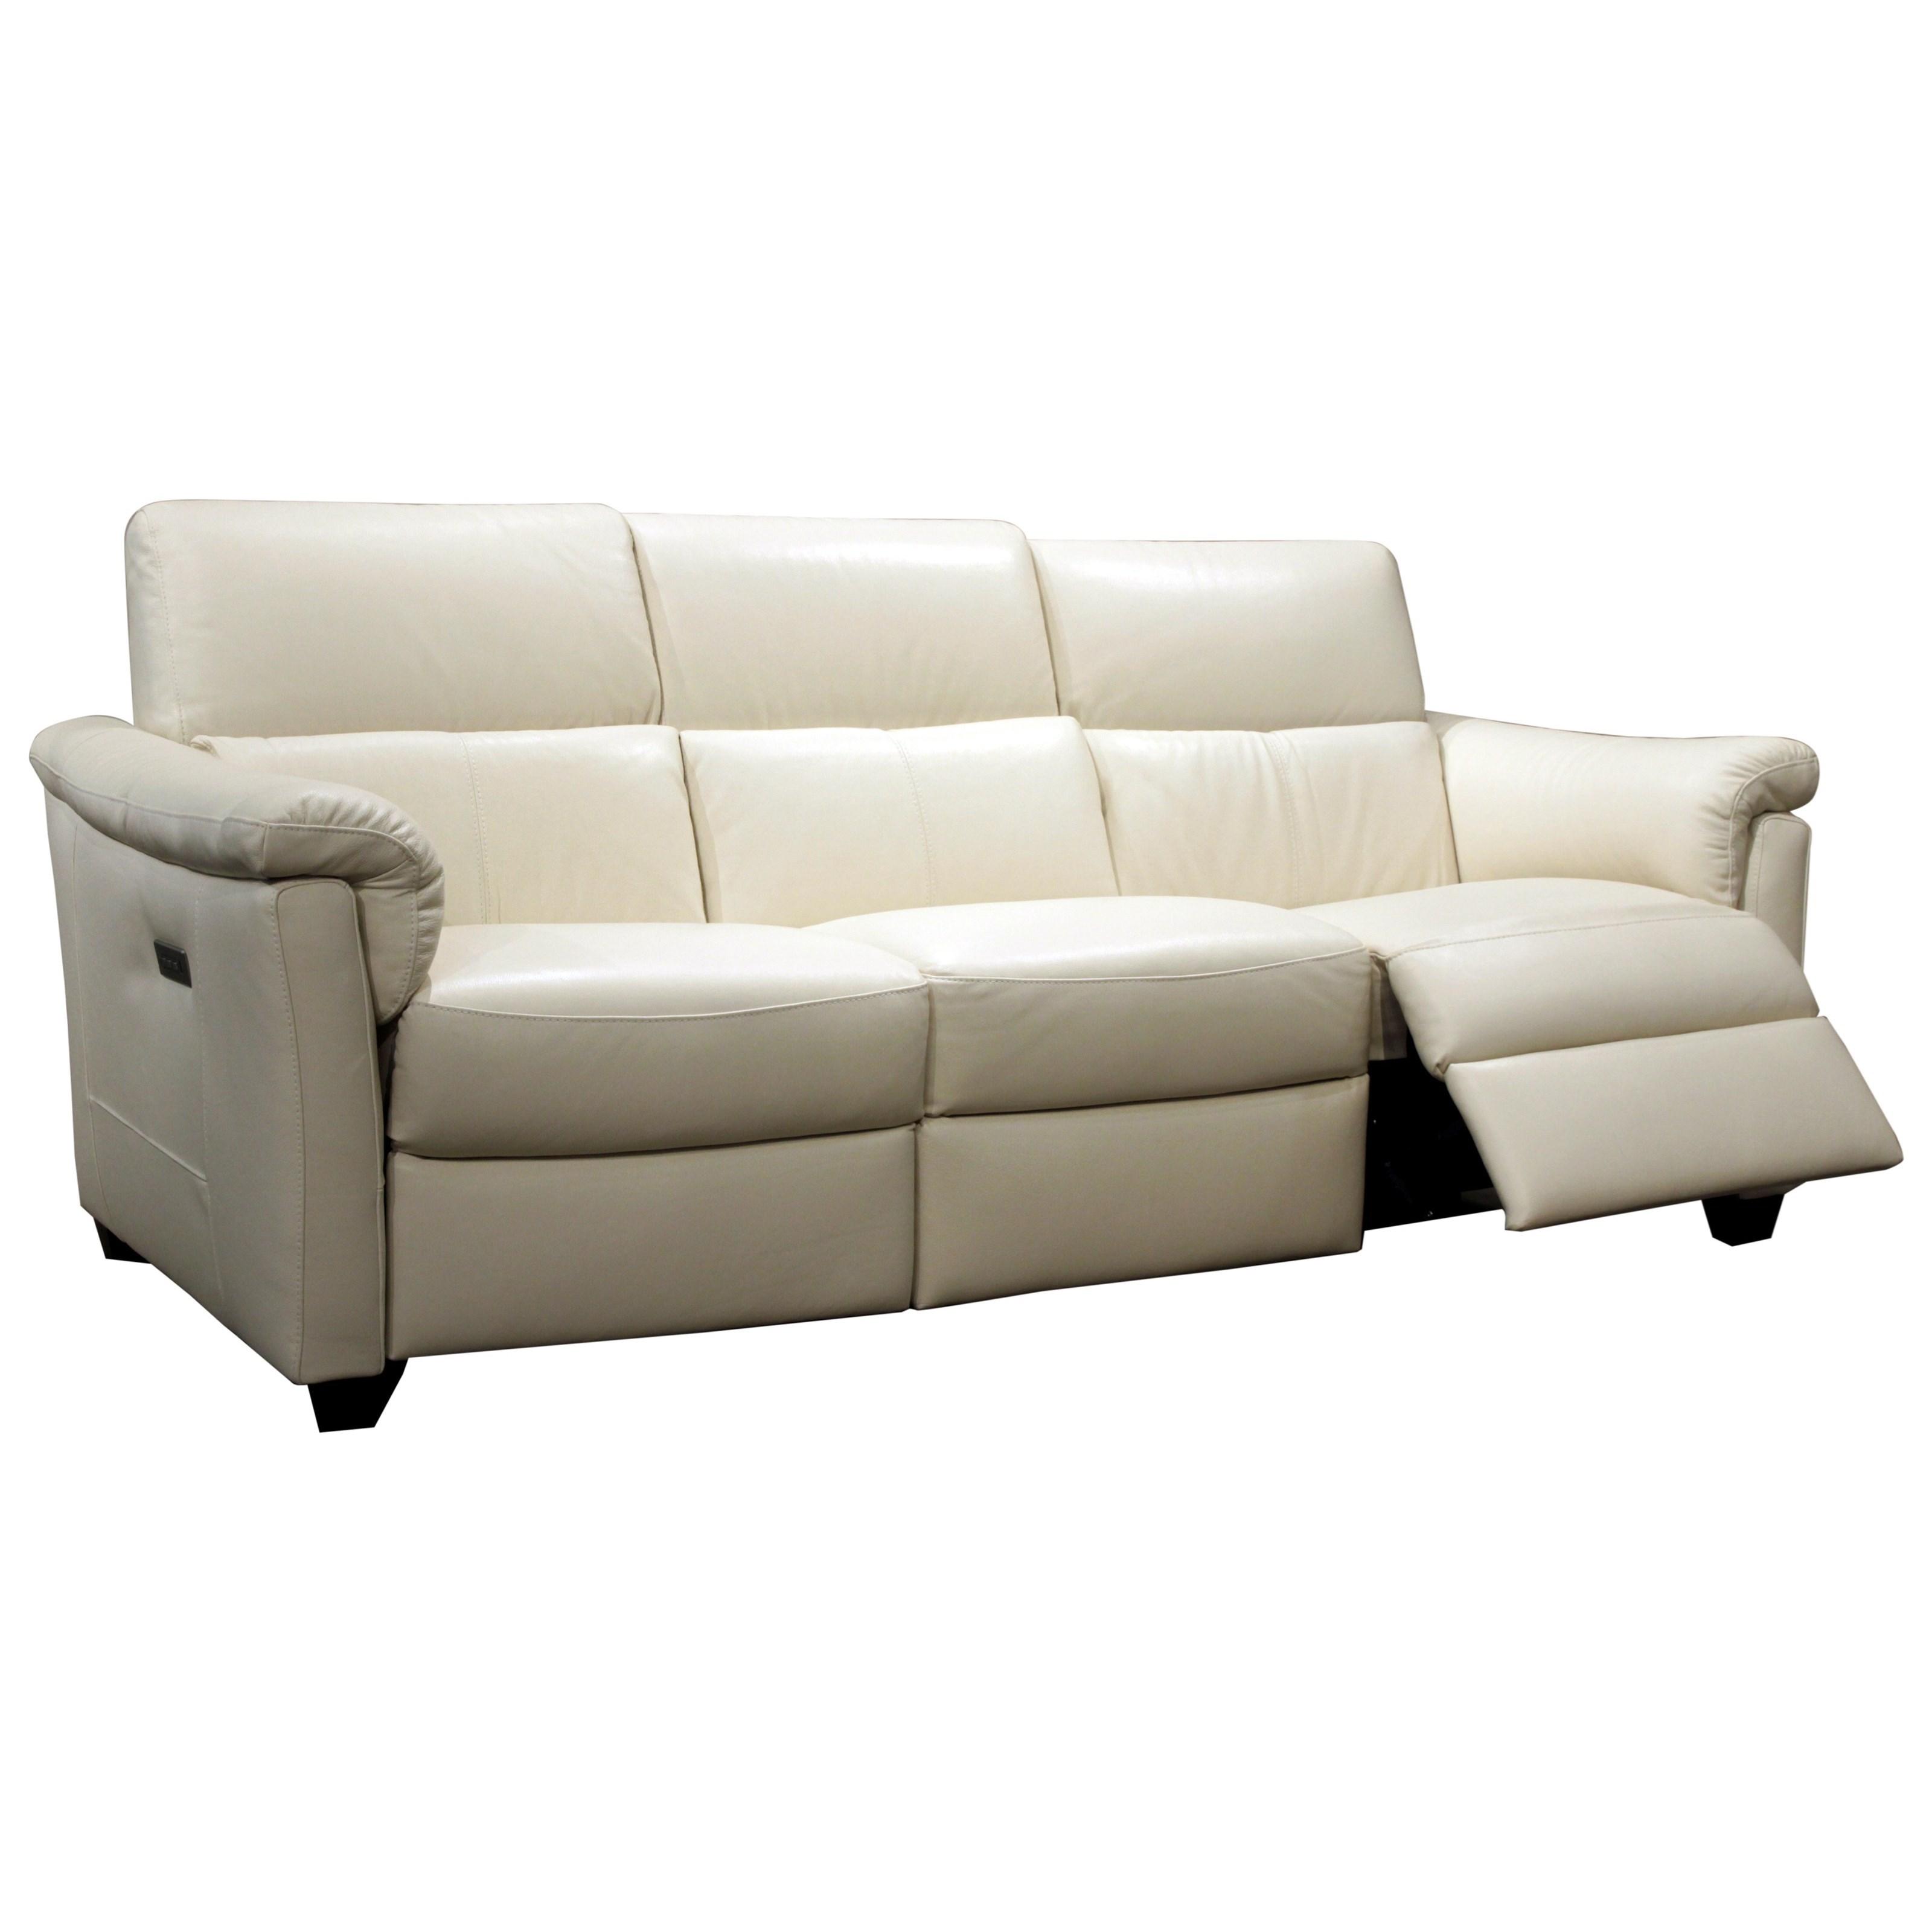 Natuzzi Editions Astuzia Power Reclining Sofa Abode